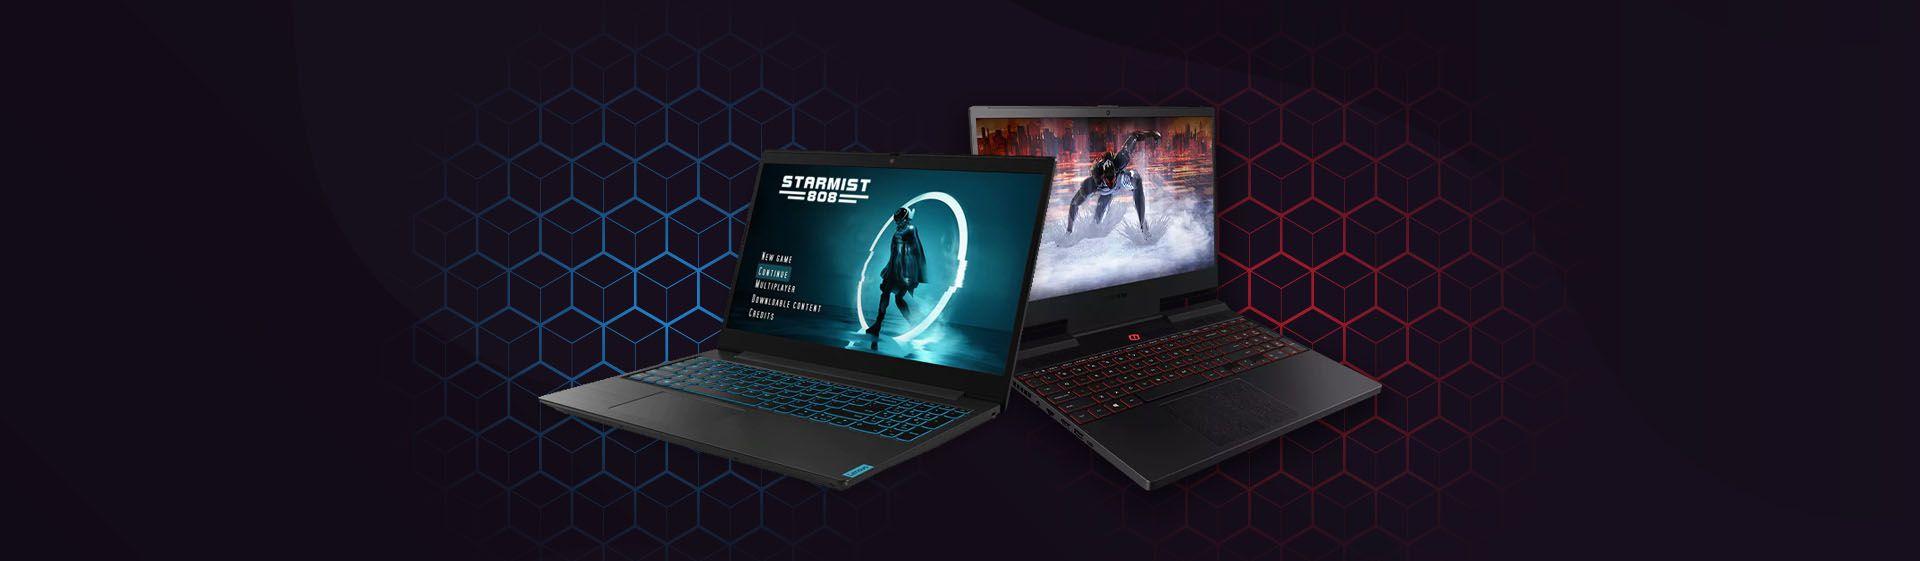 Notebook gamer na Black Friday 2020: 8 laptops que podem ficar baratos